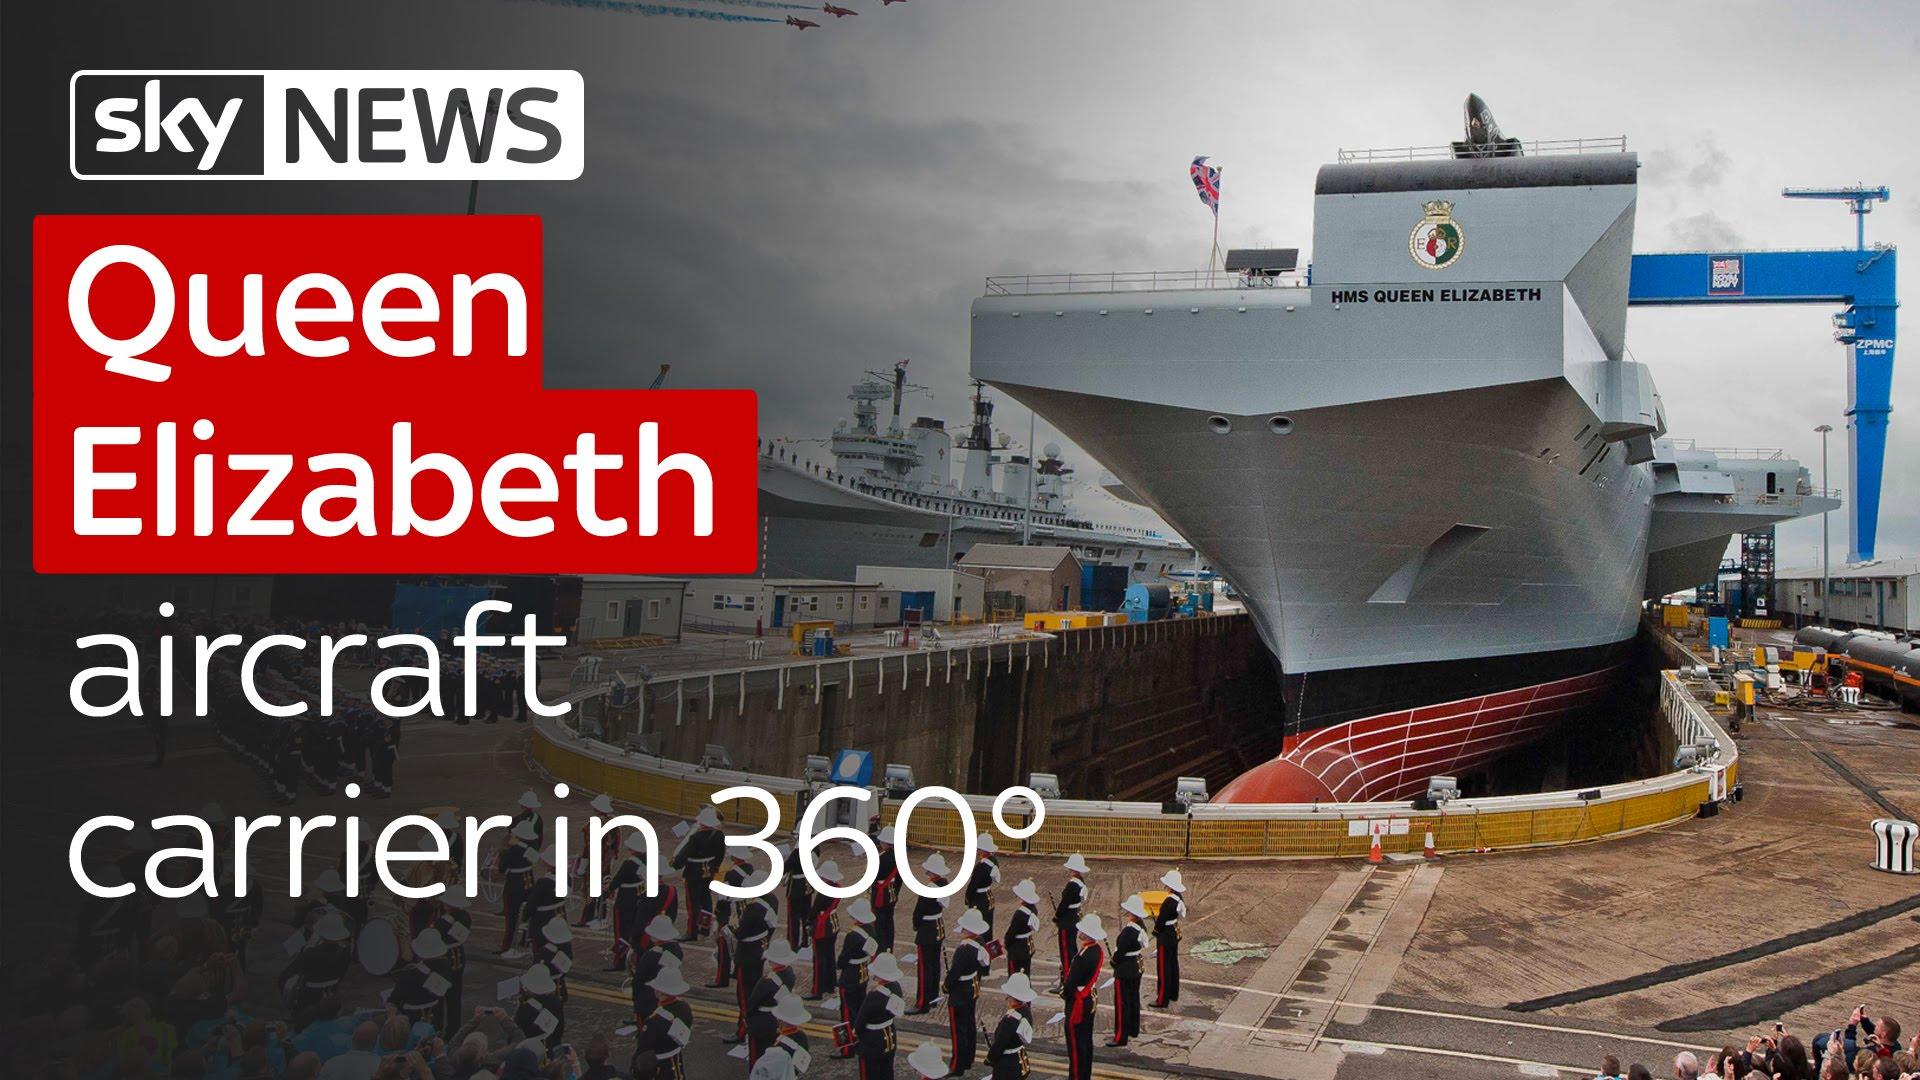 Queen Elizabeth aircraft carrier in 360° 5